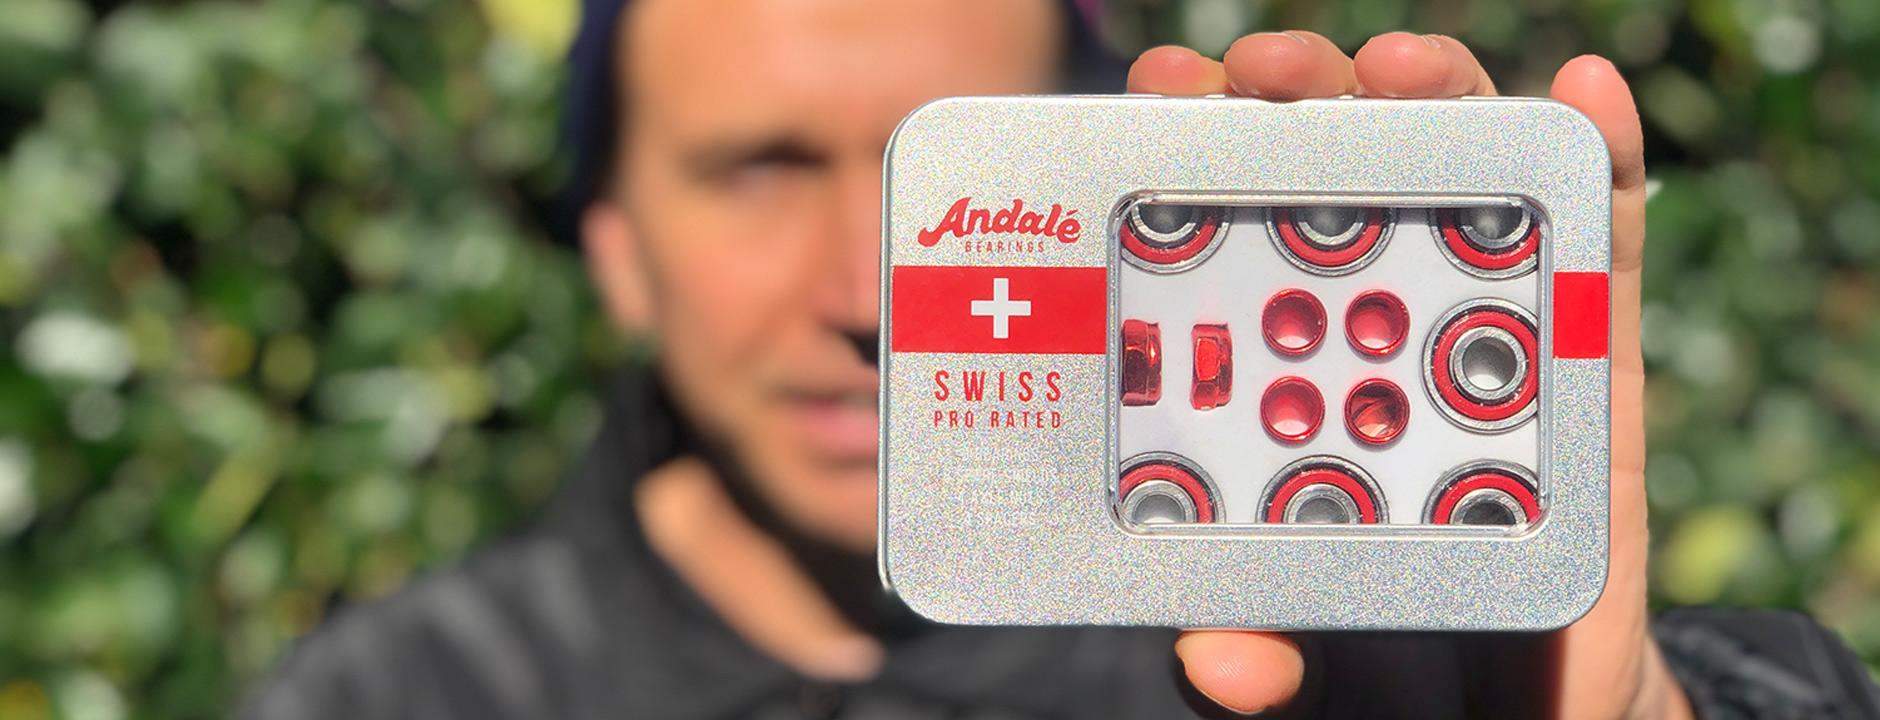 Andale_New_Swiss_Bearings_Joey_Brezinski_TYS.jpg